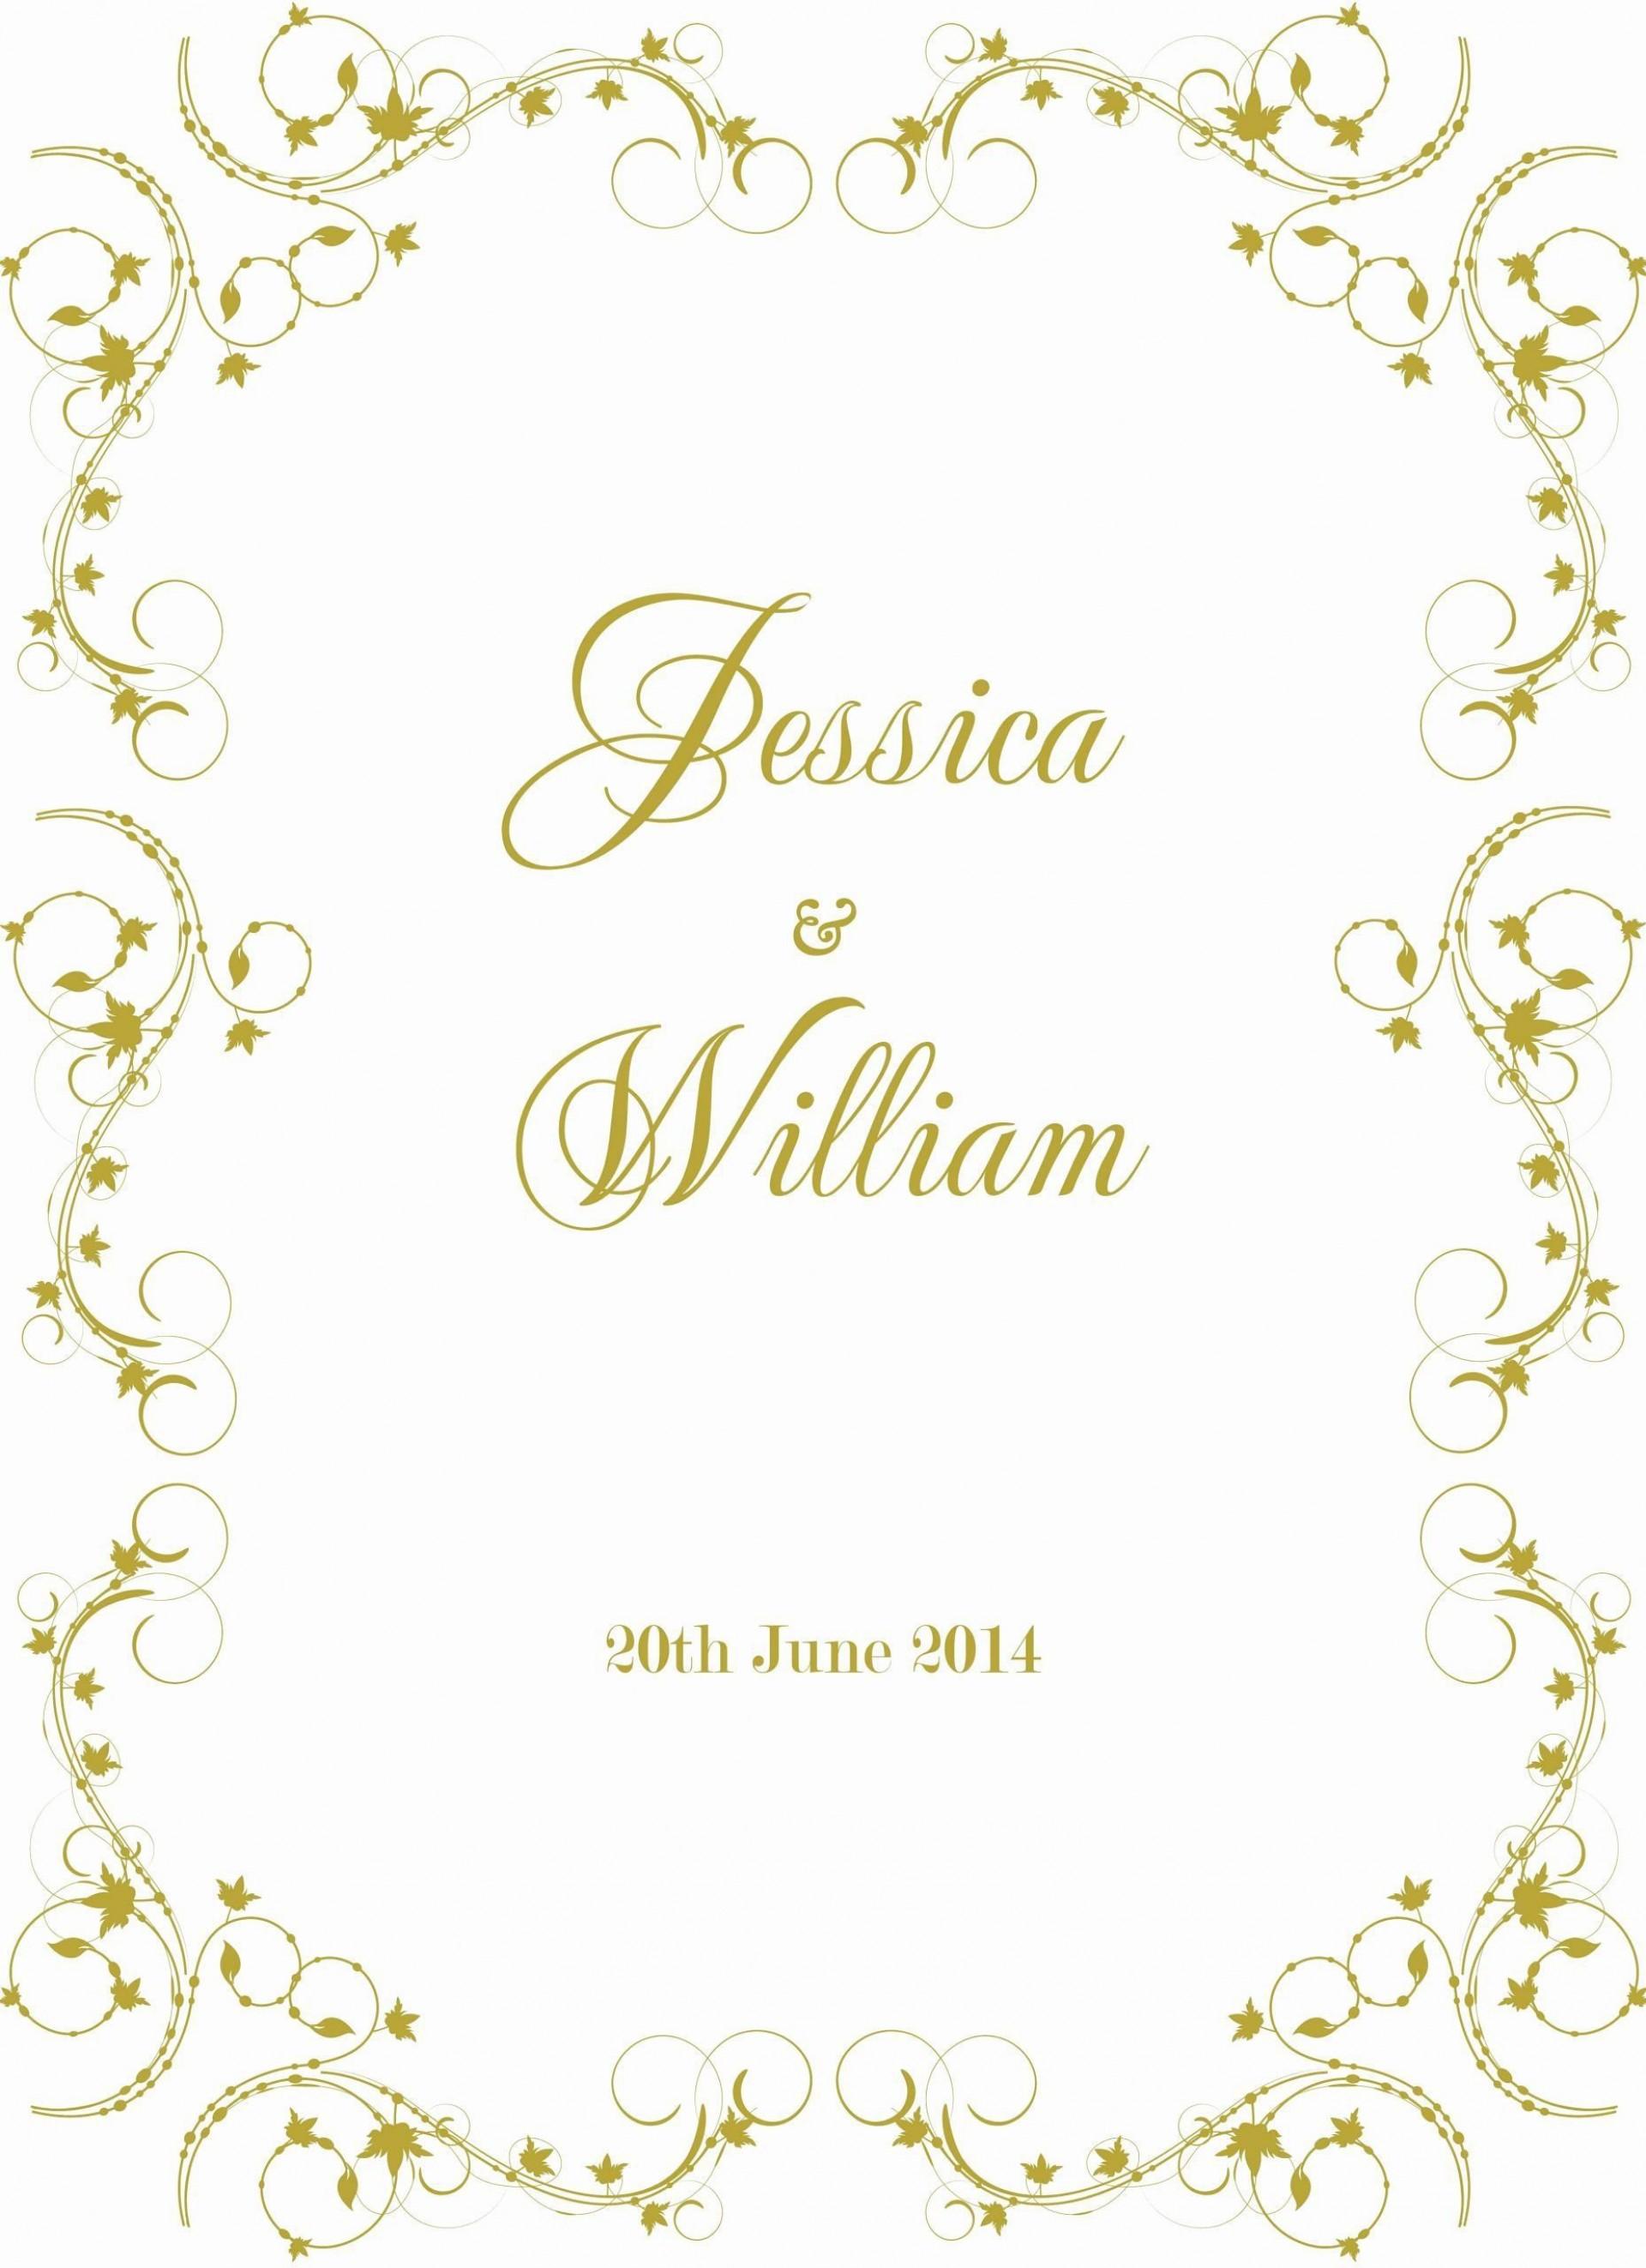 001 Striking Formal Wedding Invitation Template Free Image 1920